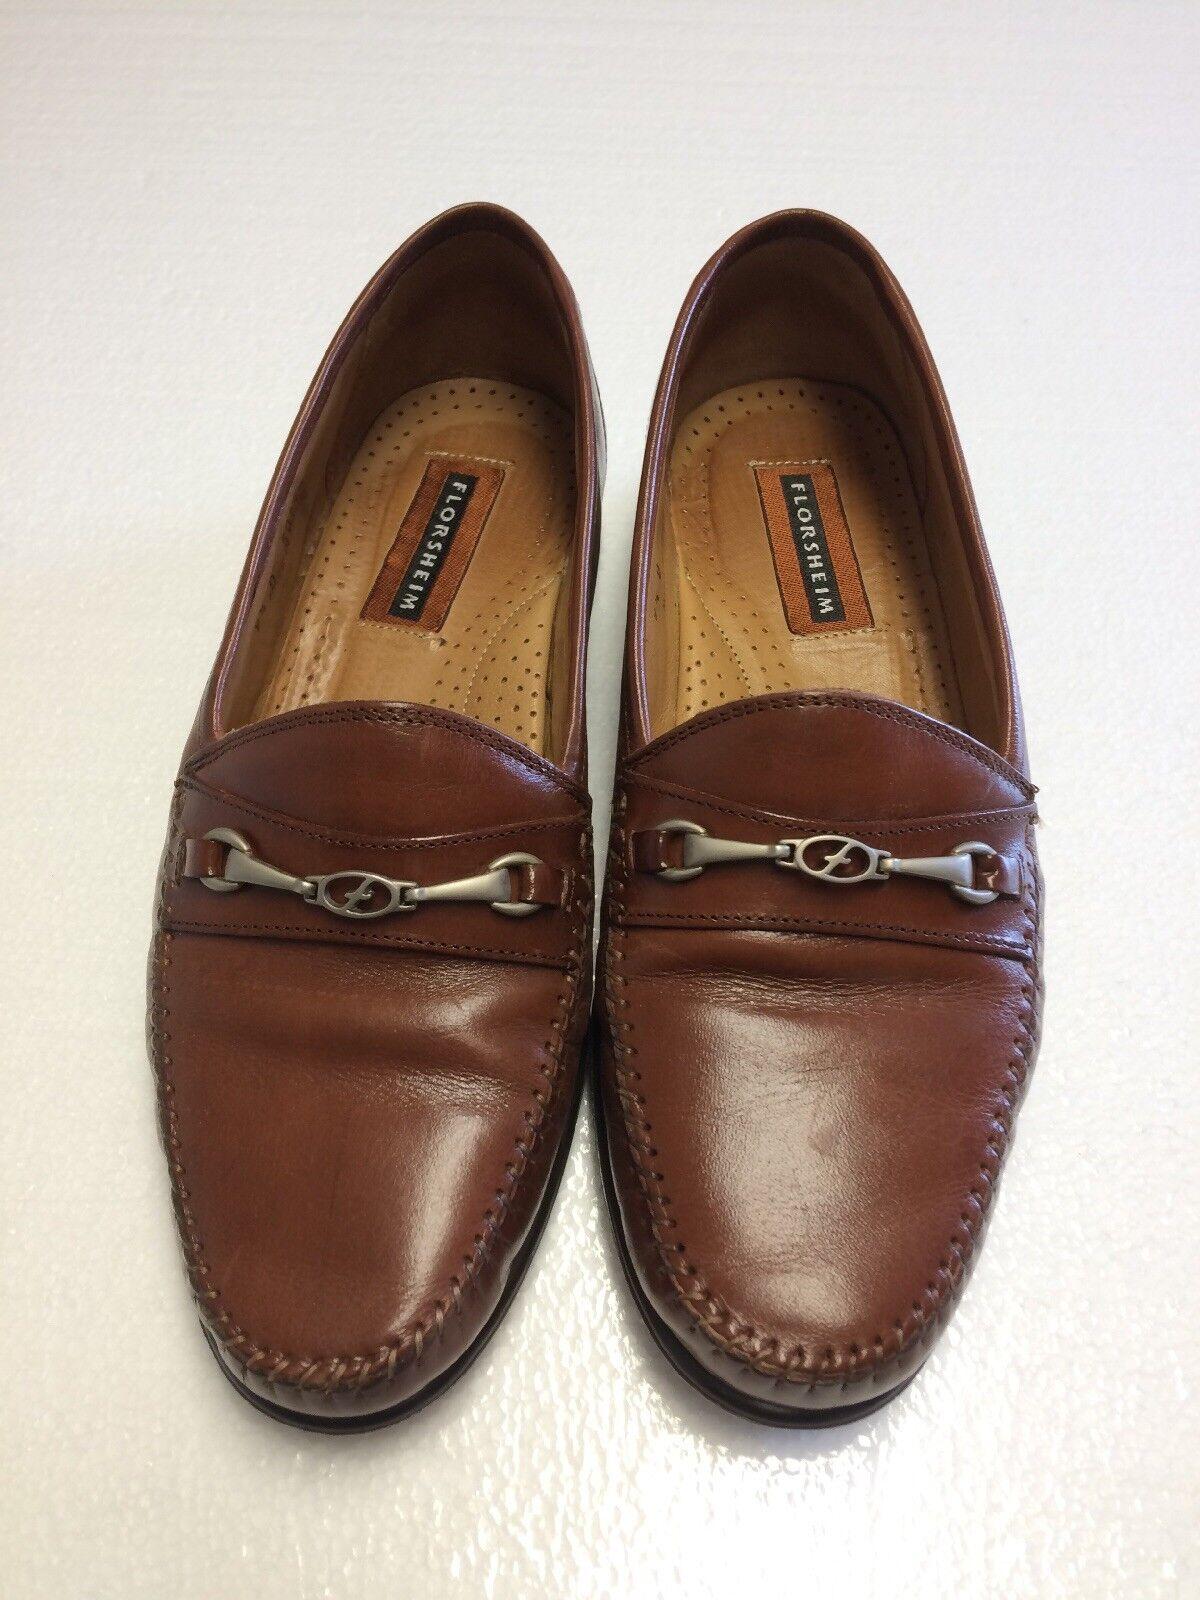 Florsheim uomo's  Cognac Brown Leather Dress Shoes Slip On Bit Loafers Size 9.5D Scarpe classiche da uomo